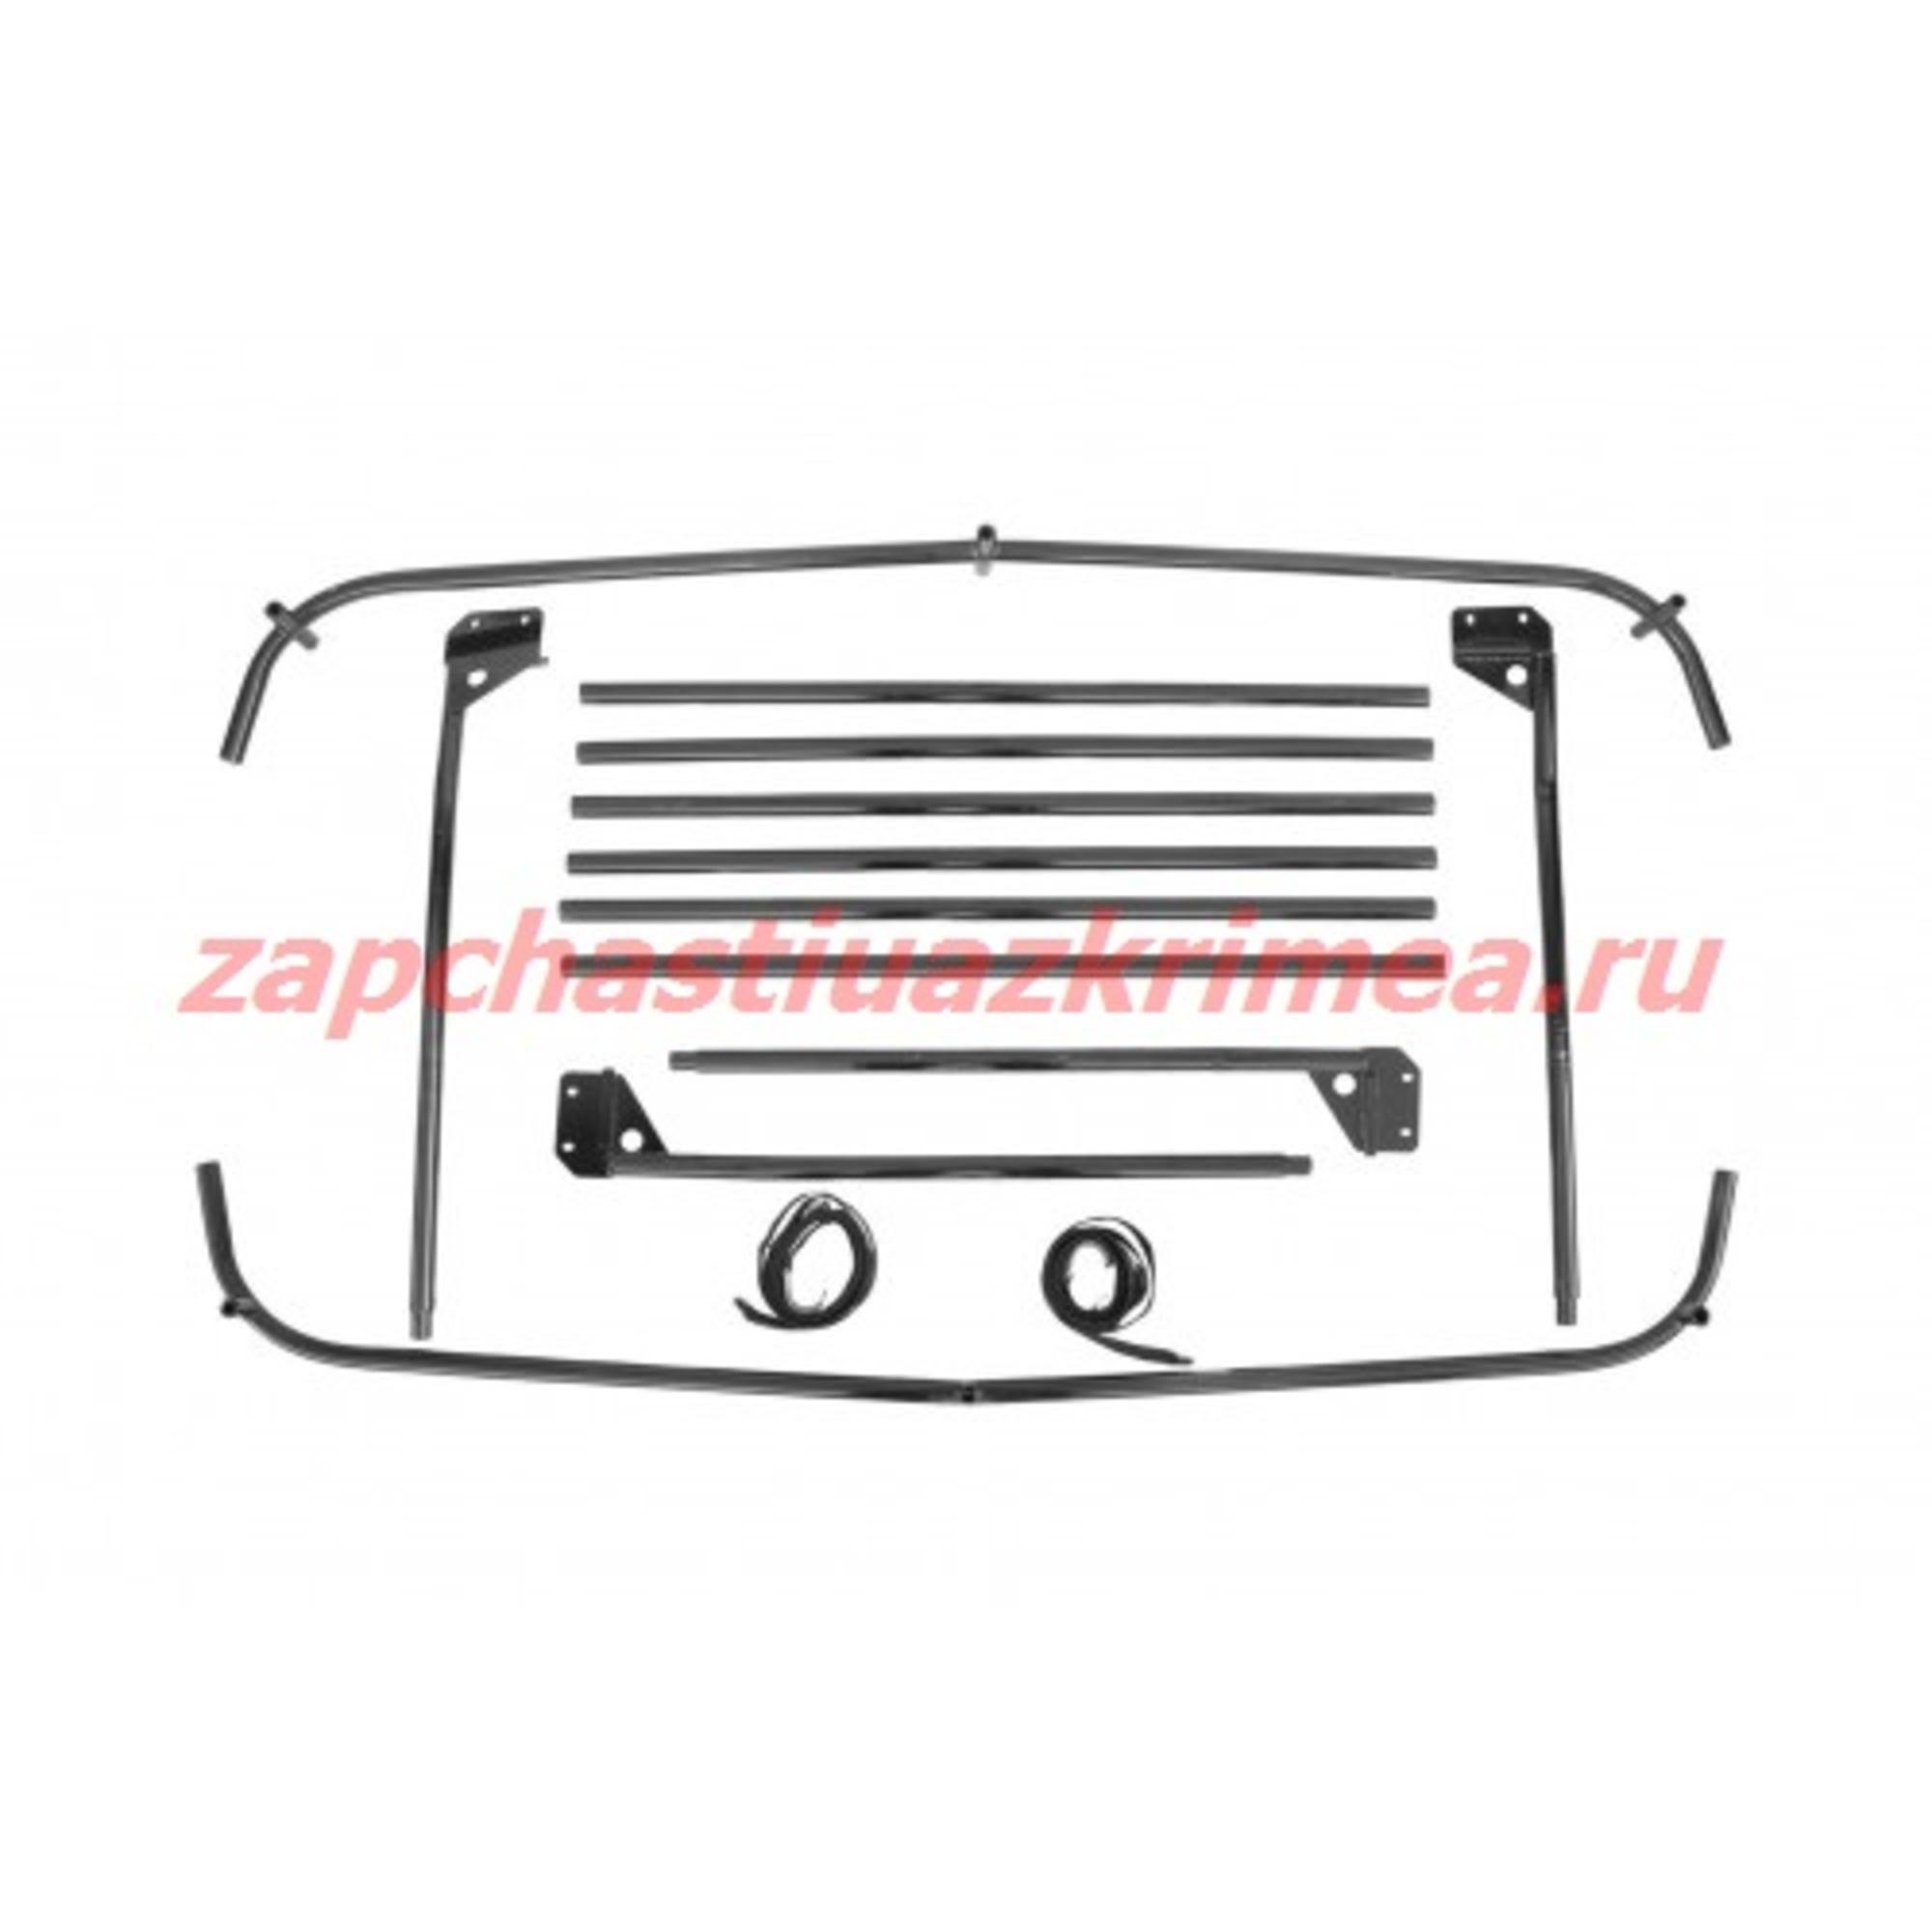 Дуги тента УАЗ 39094-50 нового образца